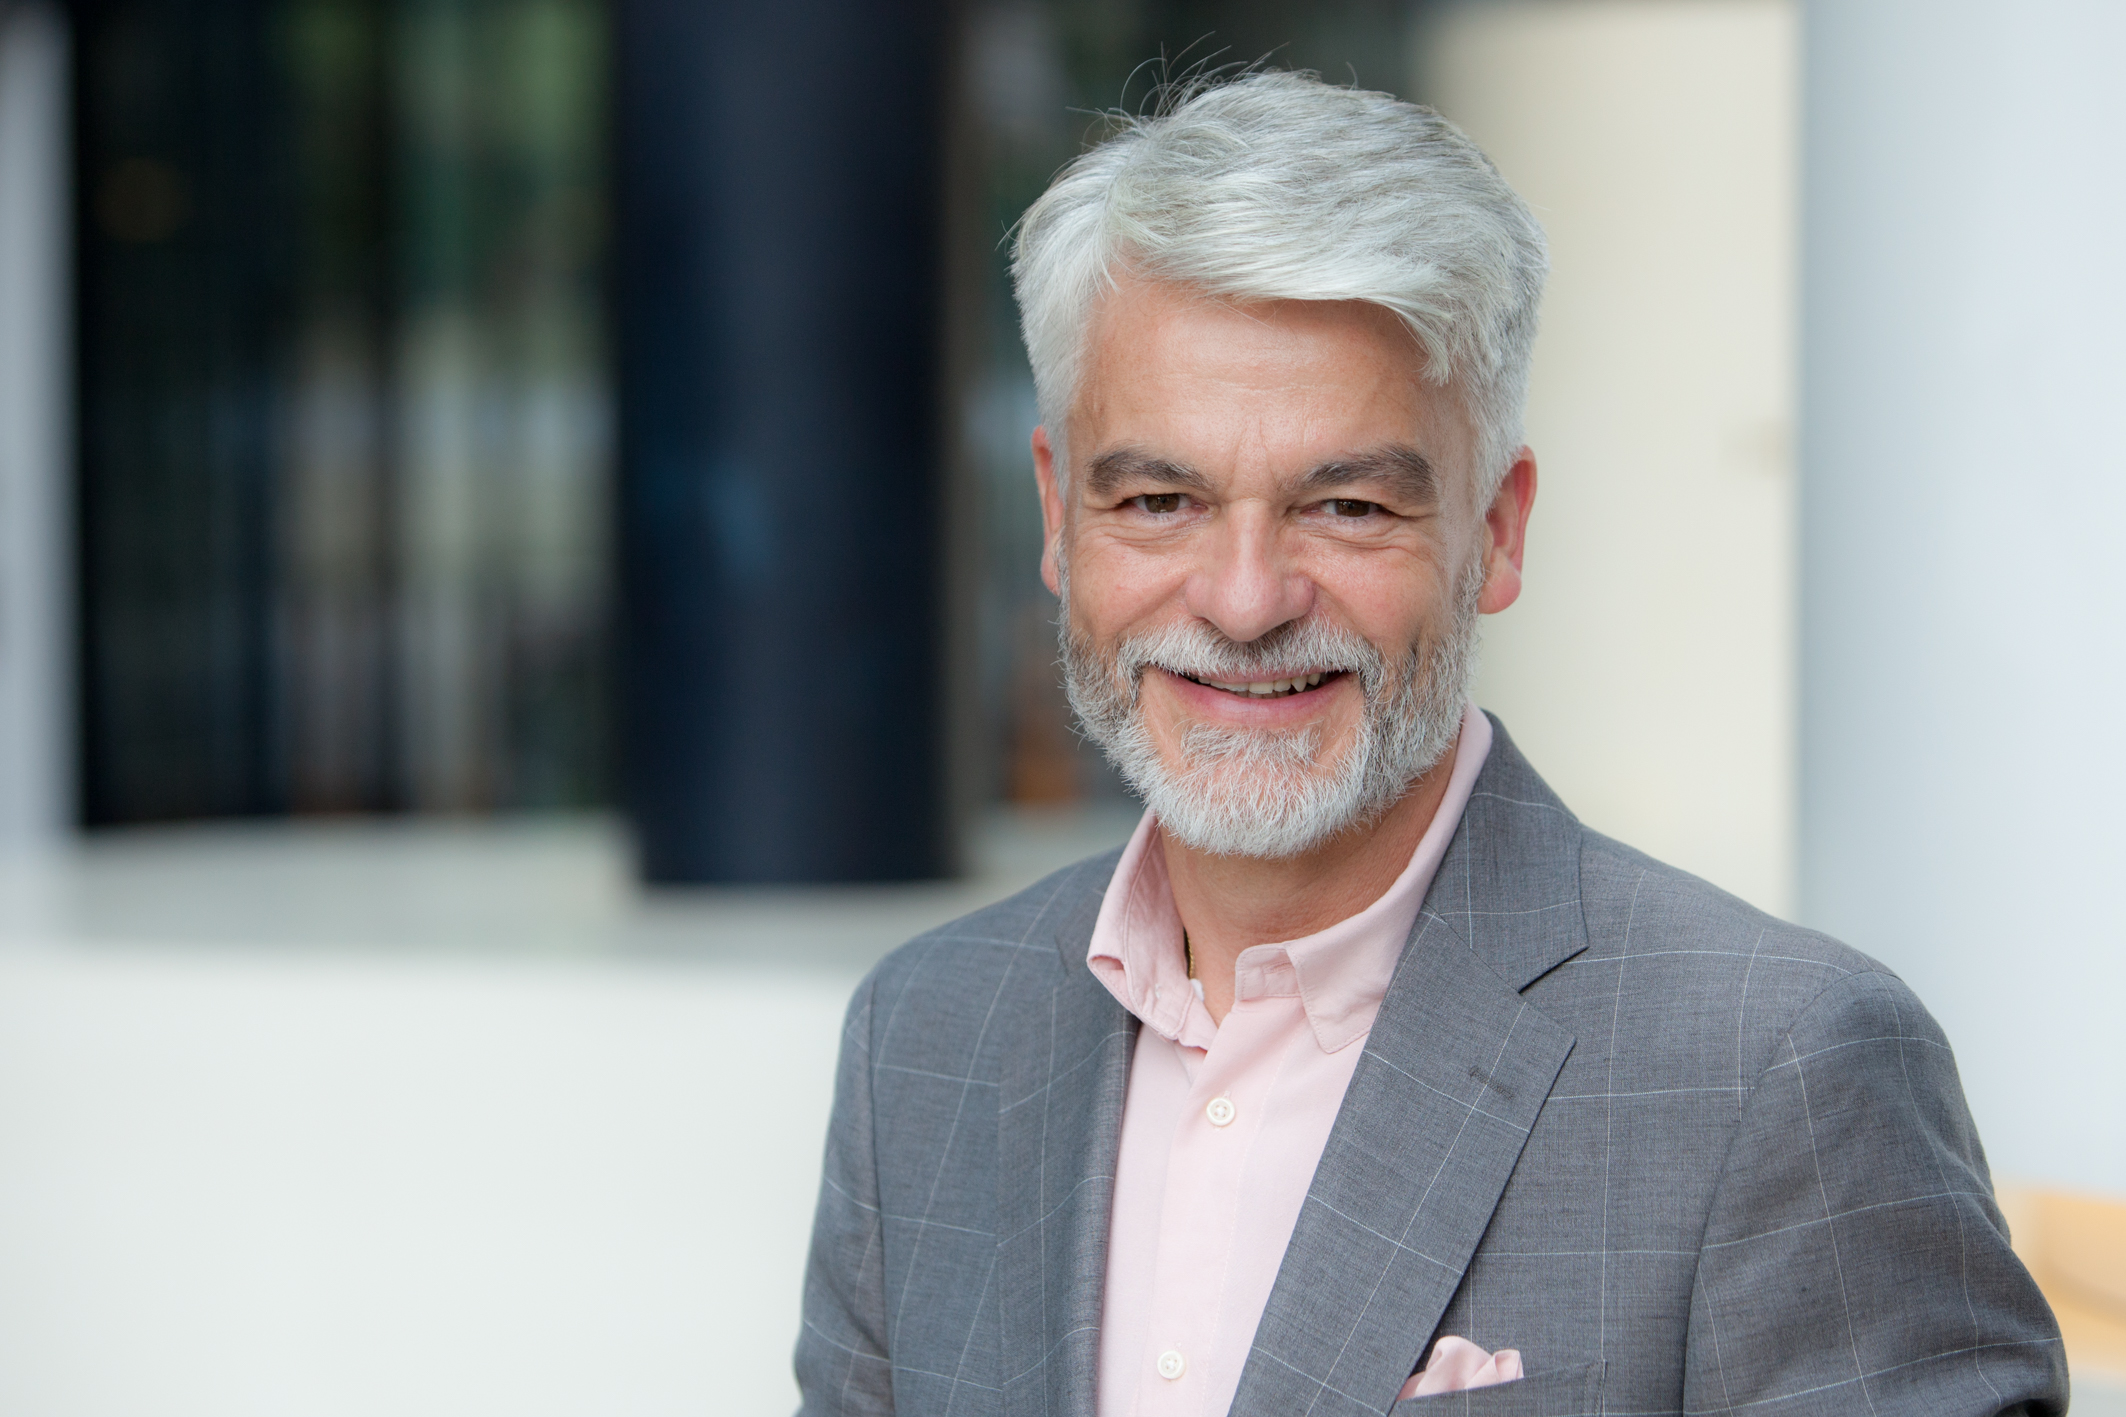 Christian Kipper, Geschäftsführer der Deutschen Fernsehlotterie